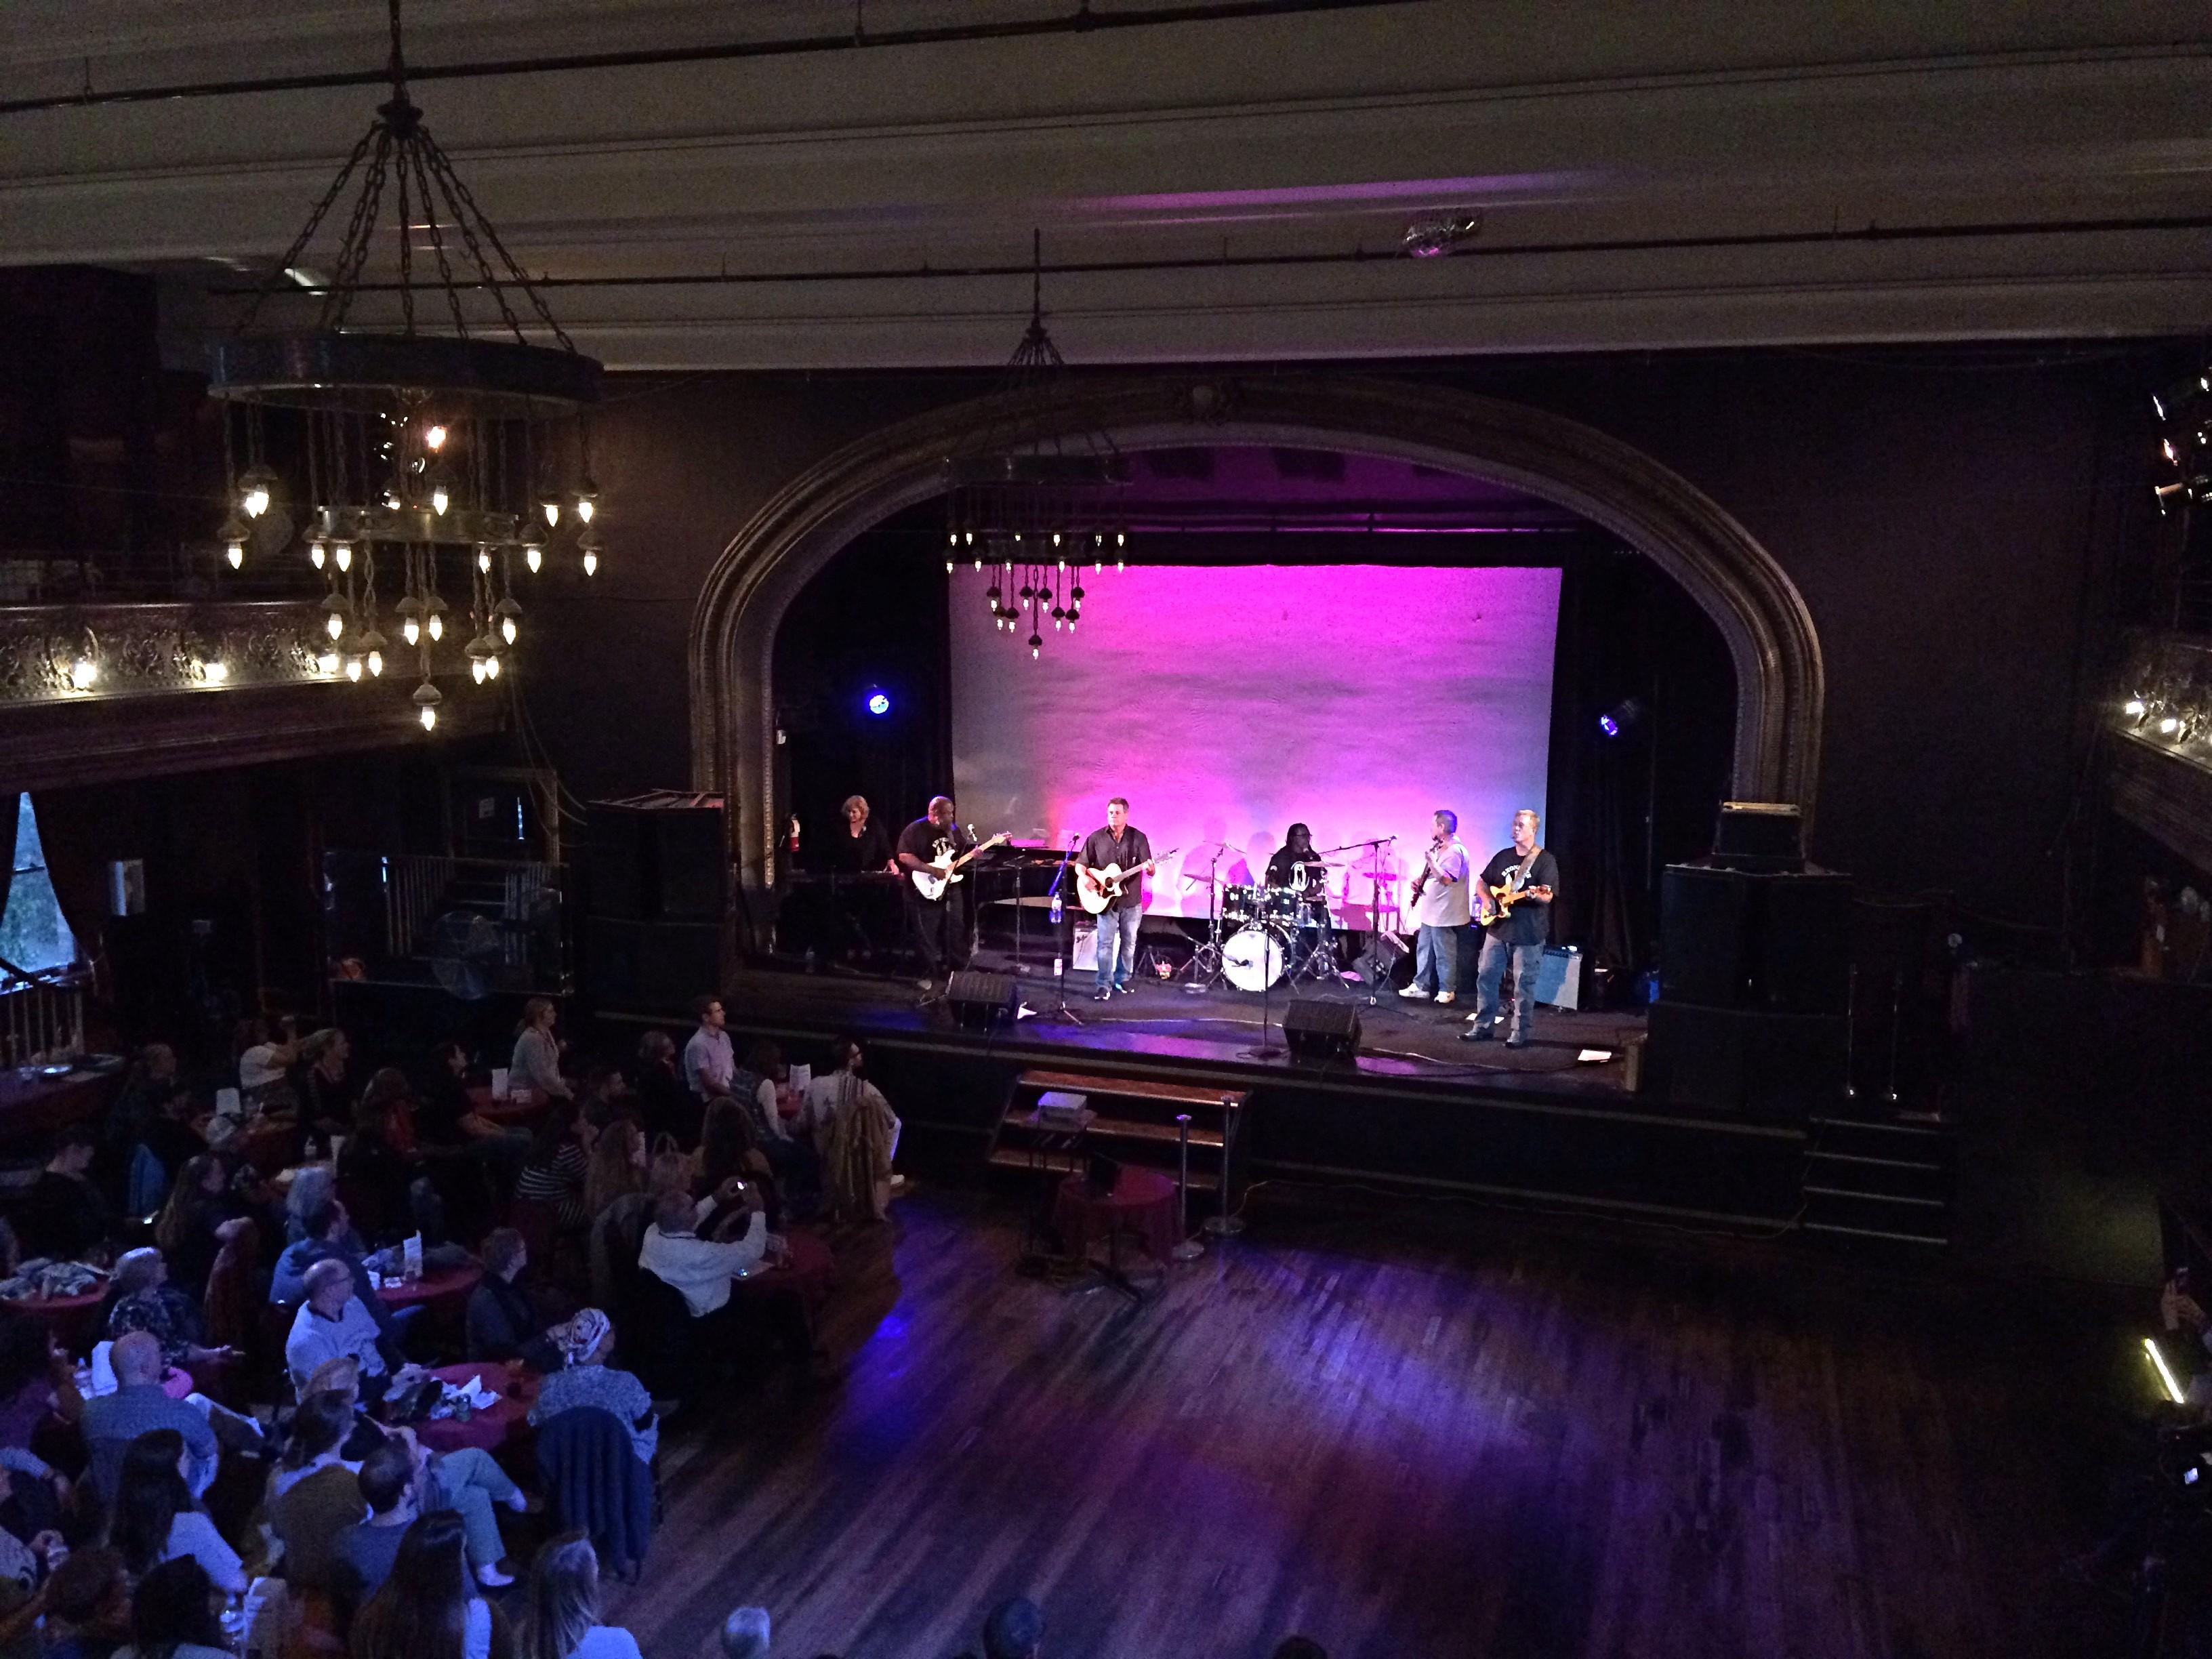 Exonree Band plays on the Century Ballroom stage